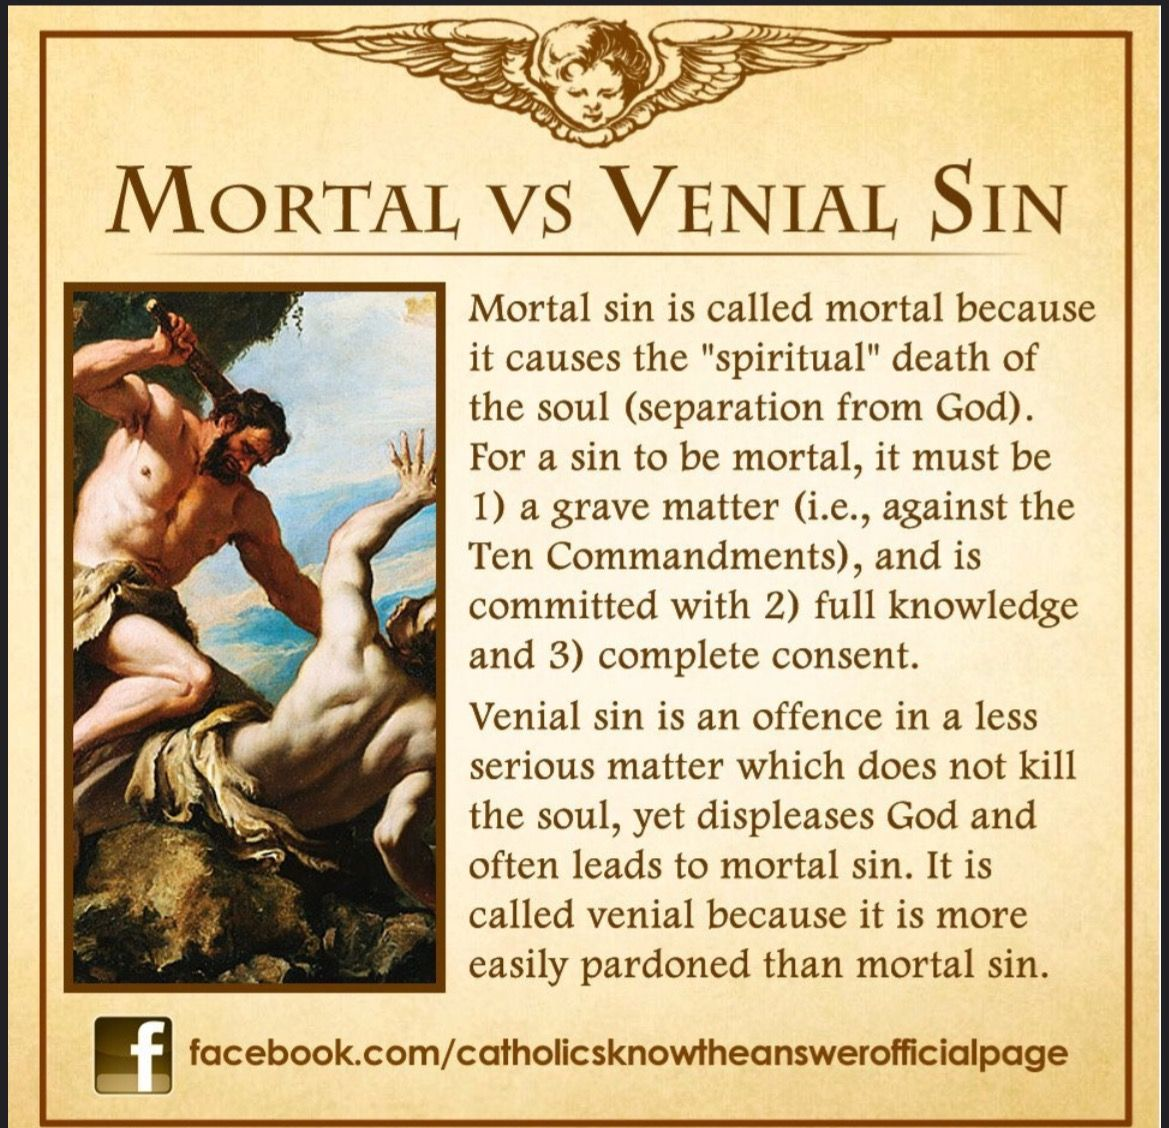 Mortal Vs Venial Sin